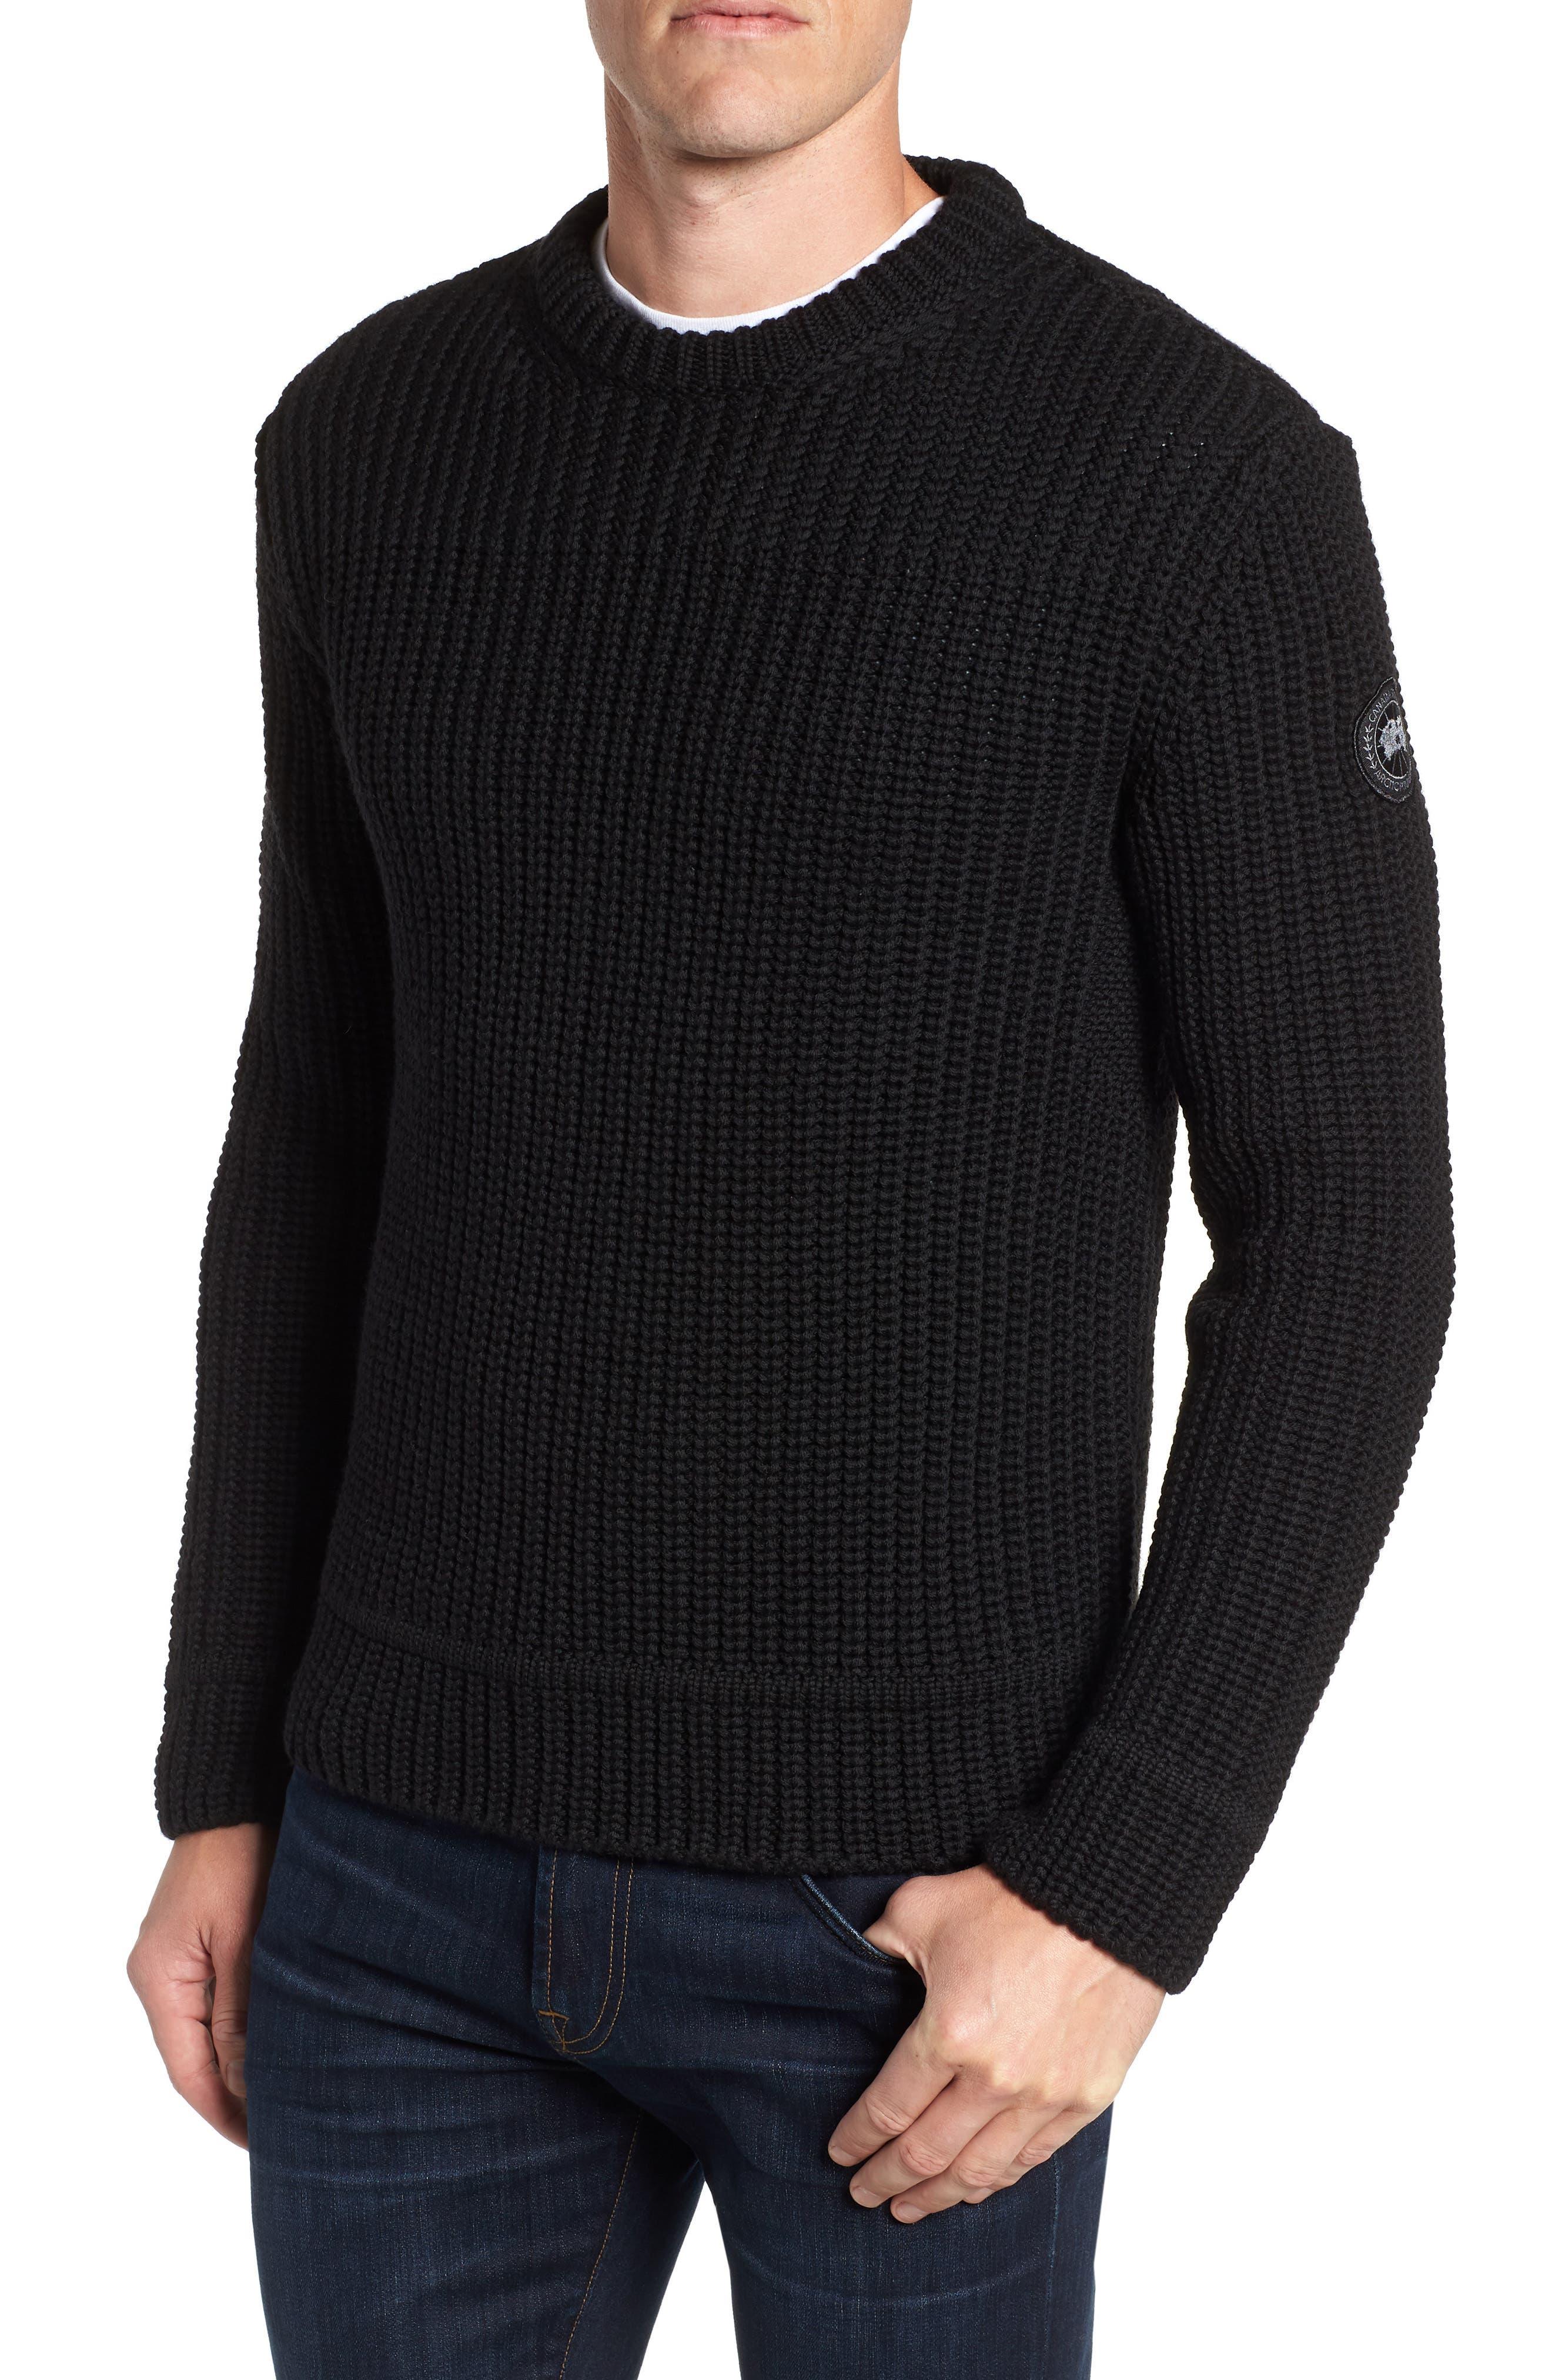 Galloway Regular Fit Merino Wool Sweater,                         Main,                         color, BLACK